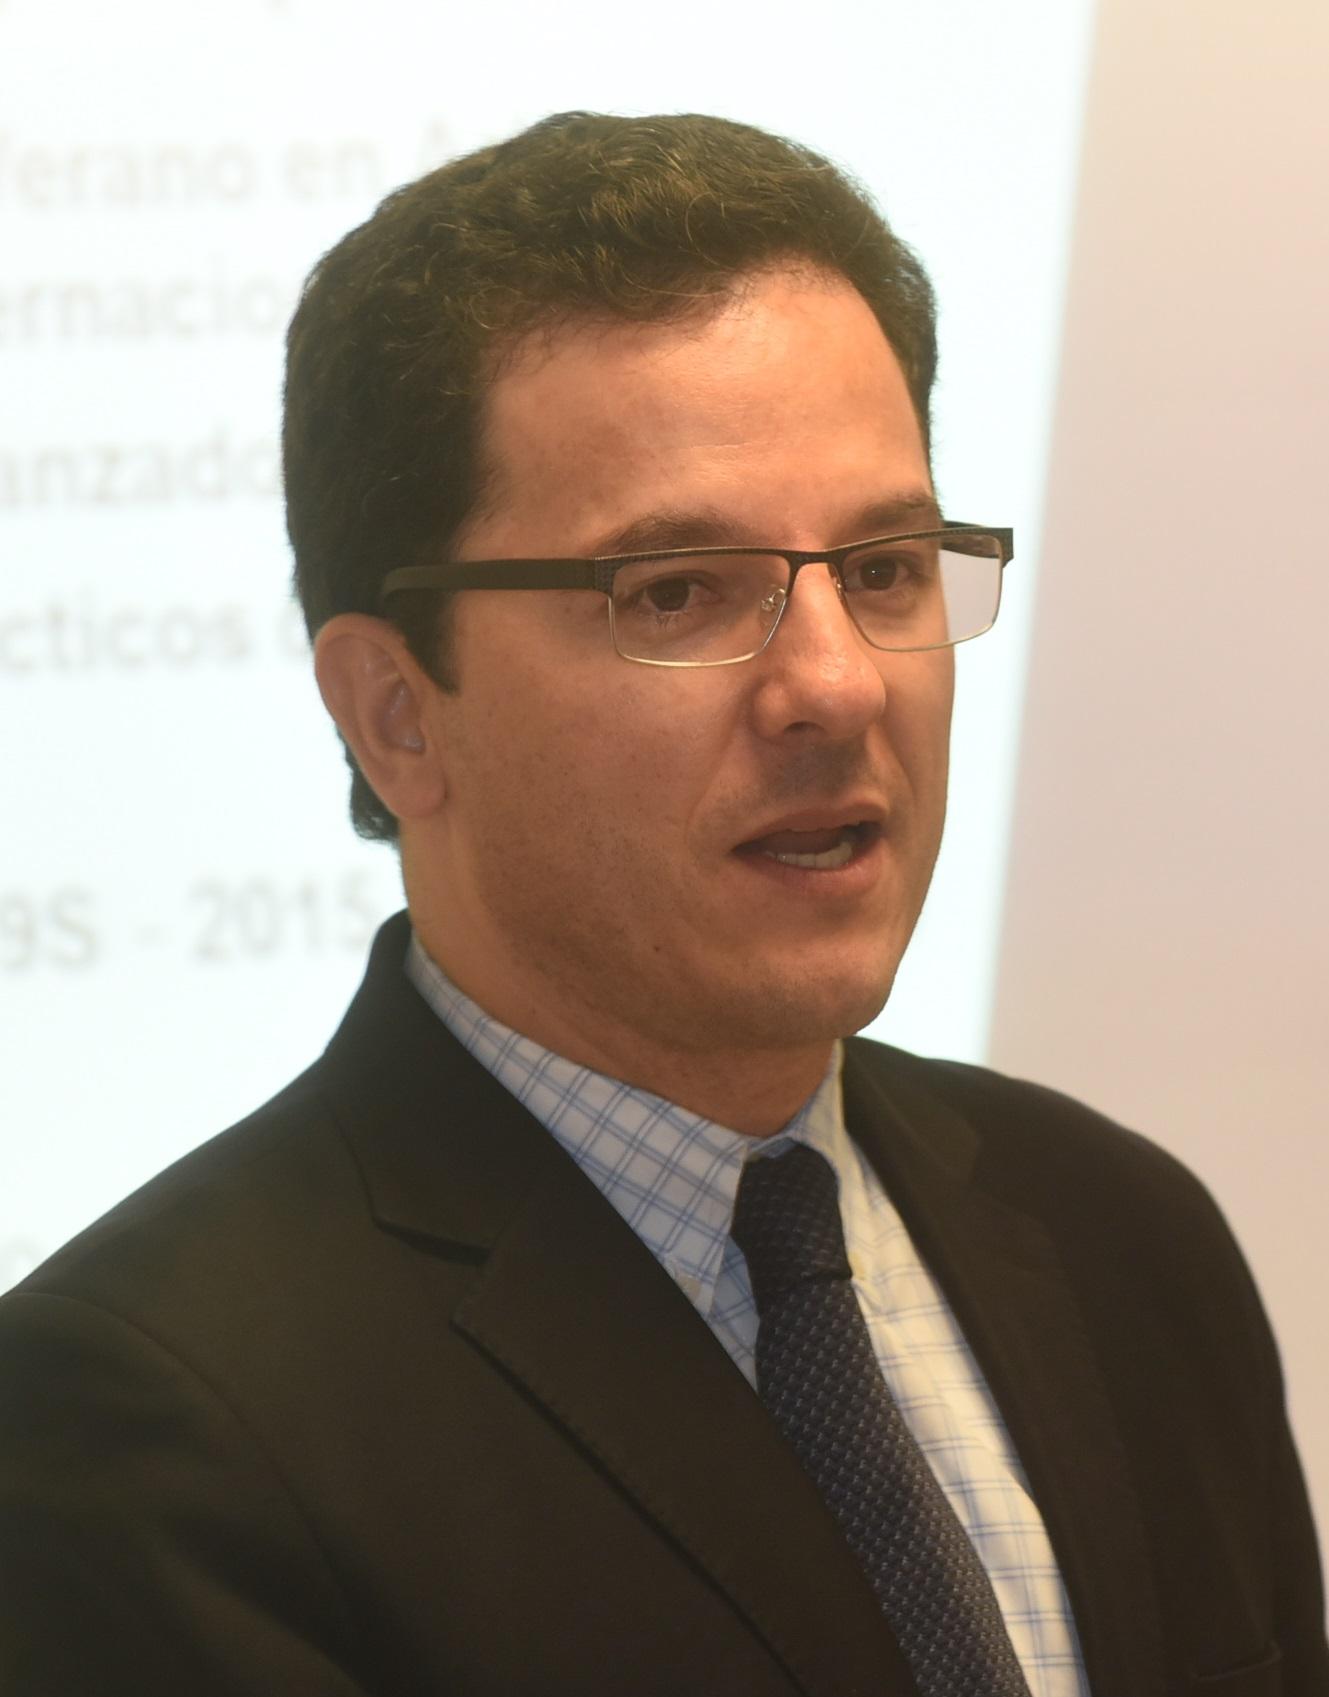 Alvaro Galindo